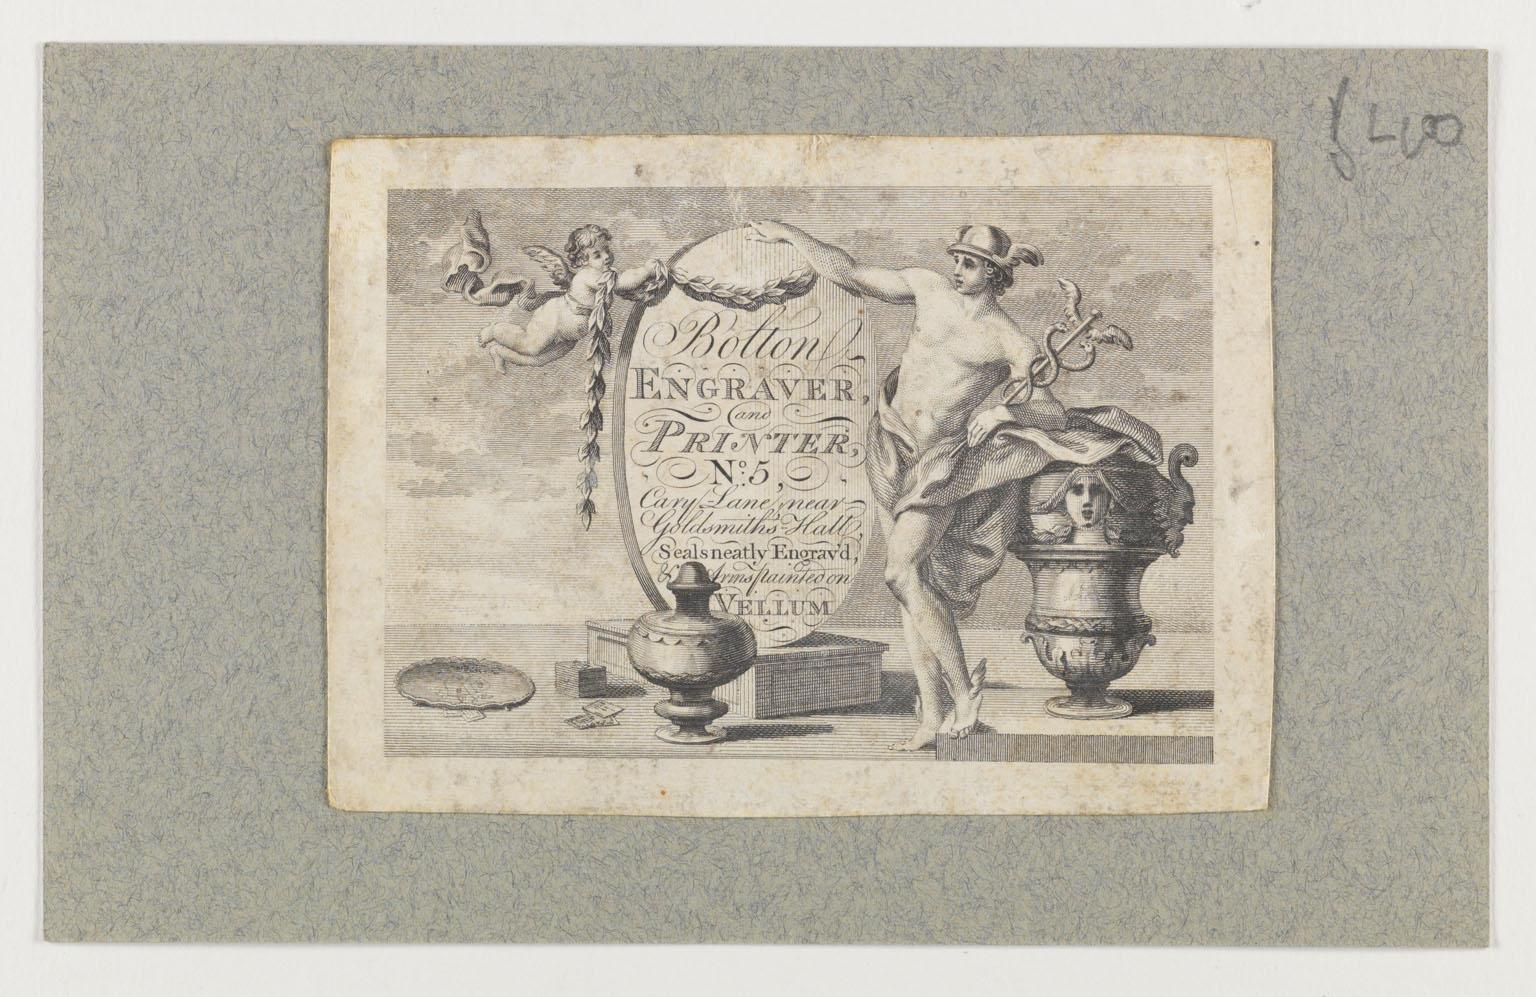 Bolton engraver and printer, No. 5 Cary Lane